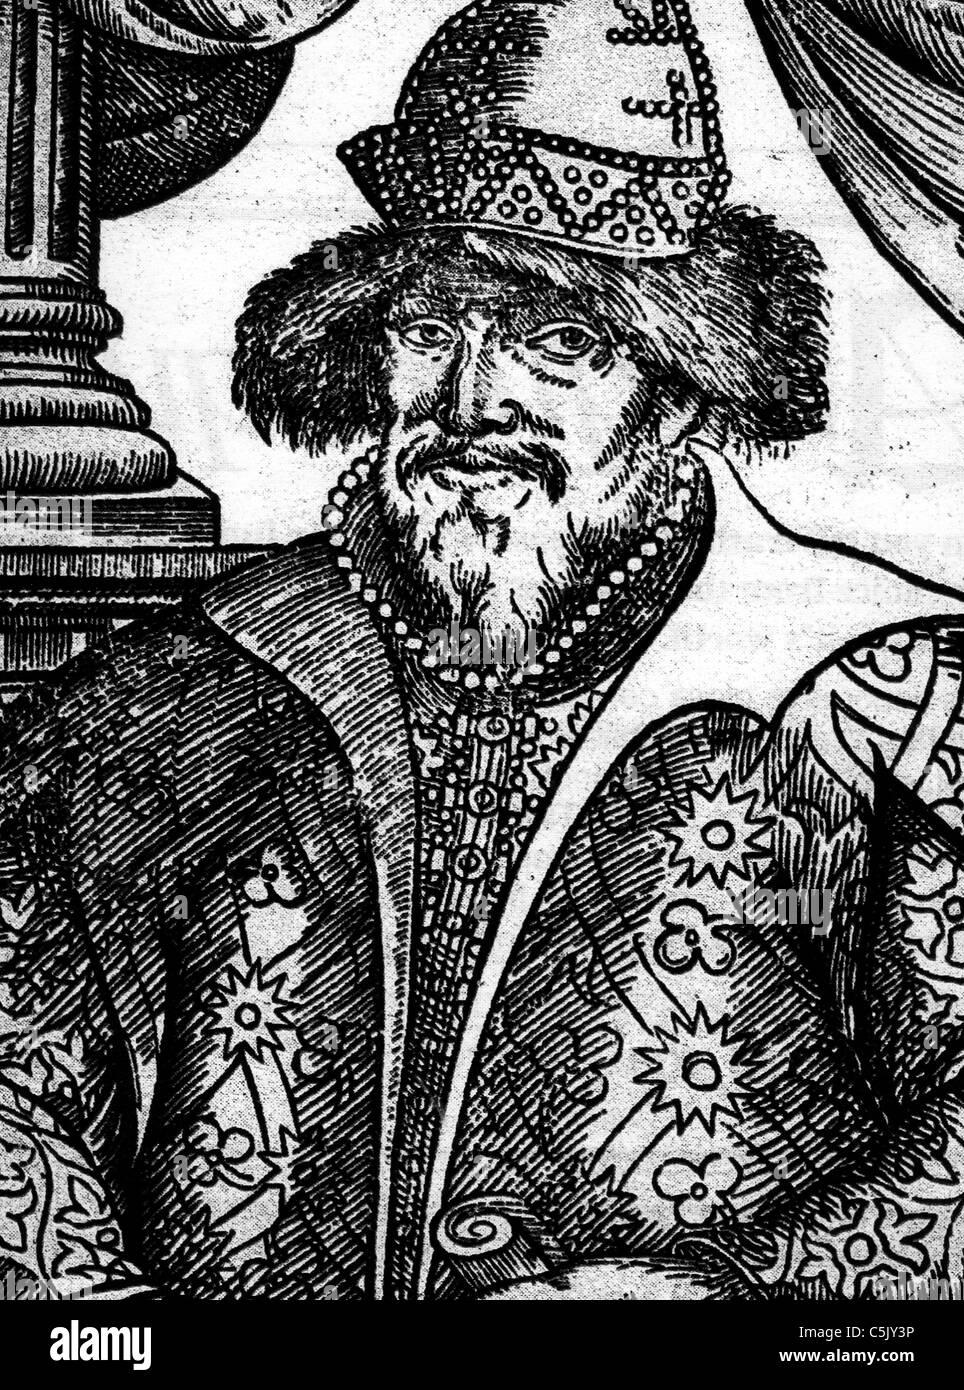 ivan the terrible, 1533-1584 - Stock Image